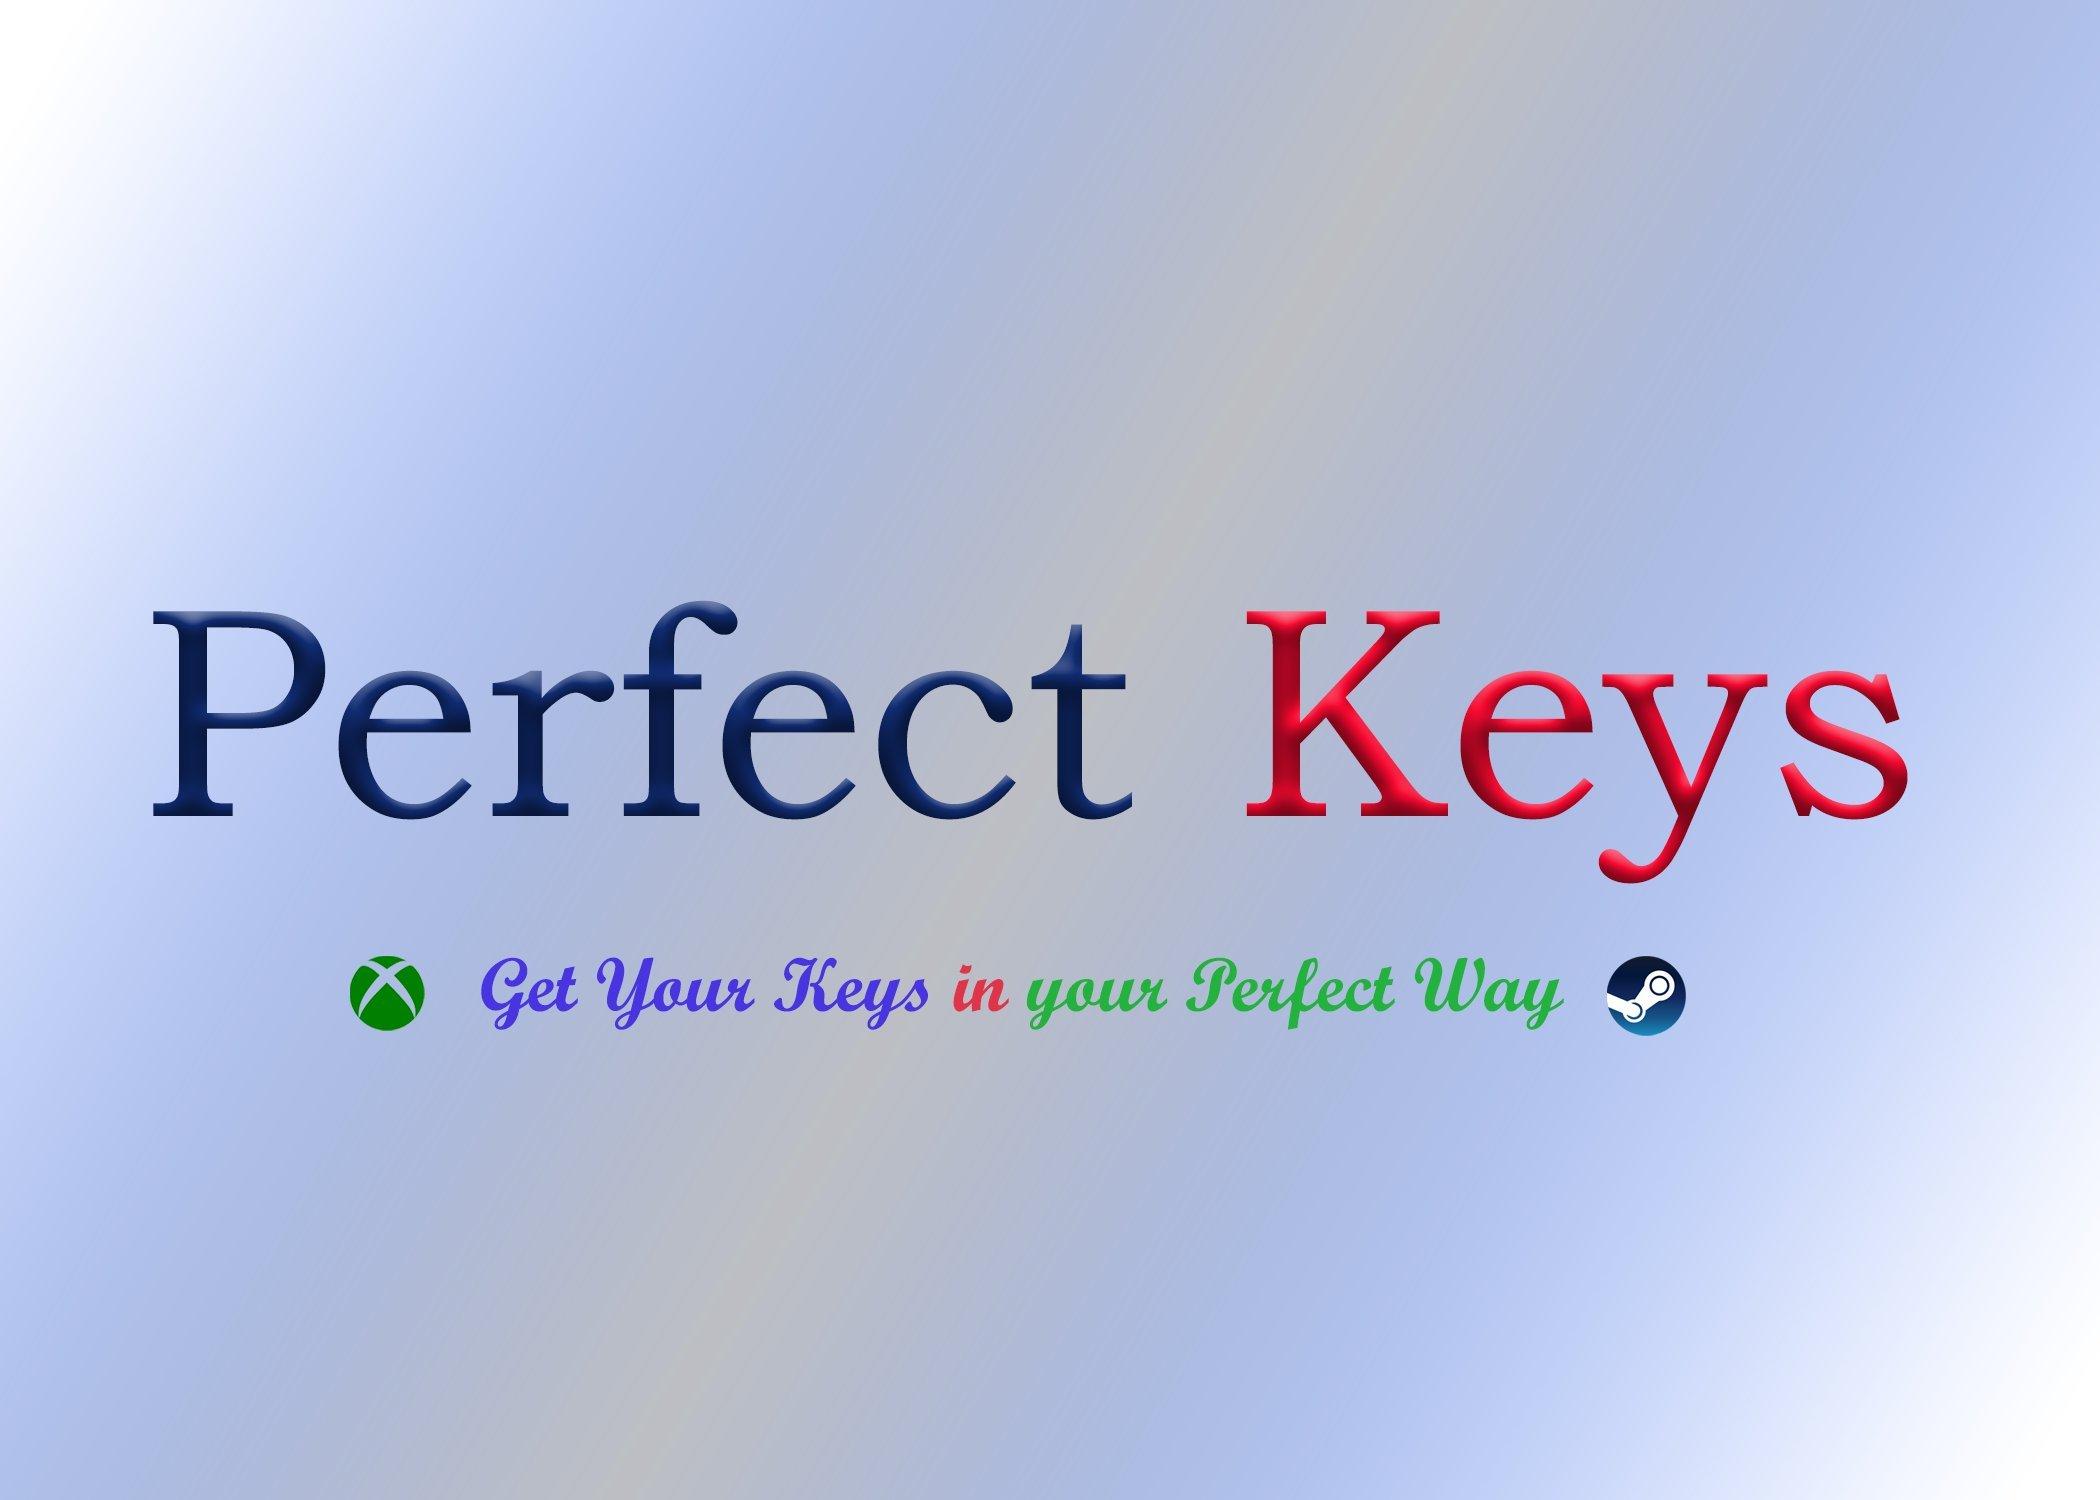 Perfect Keys